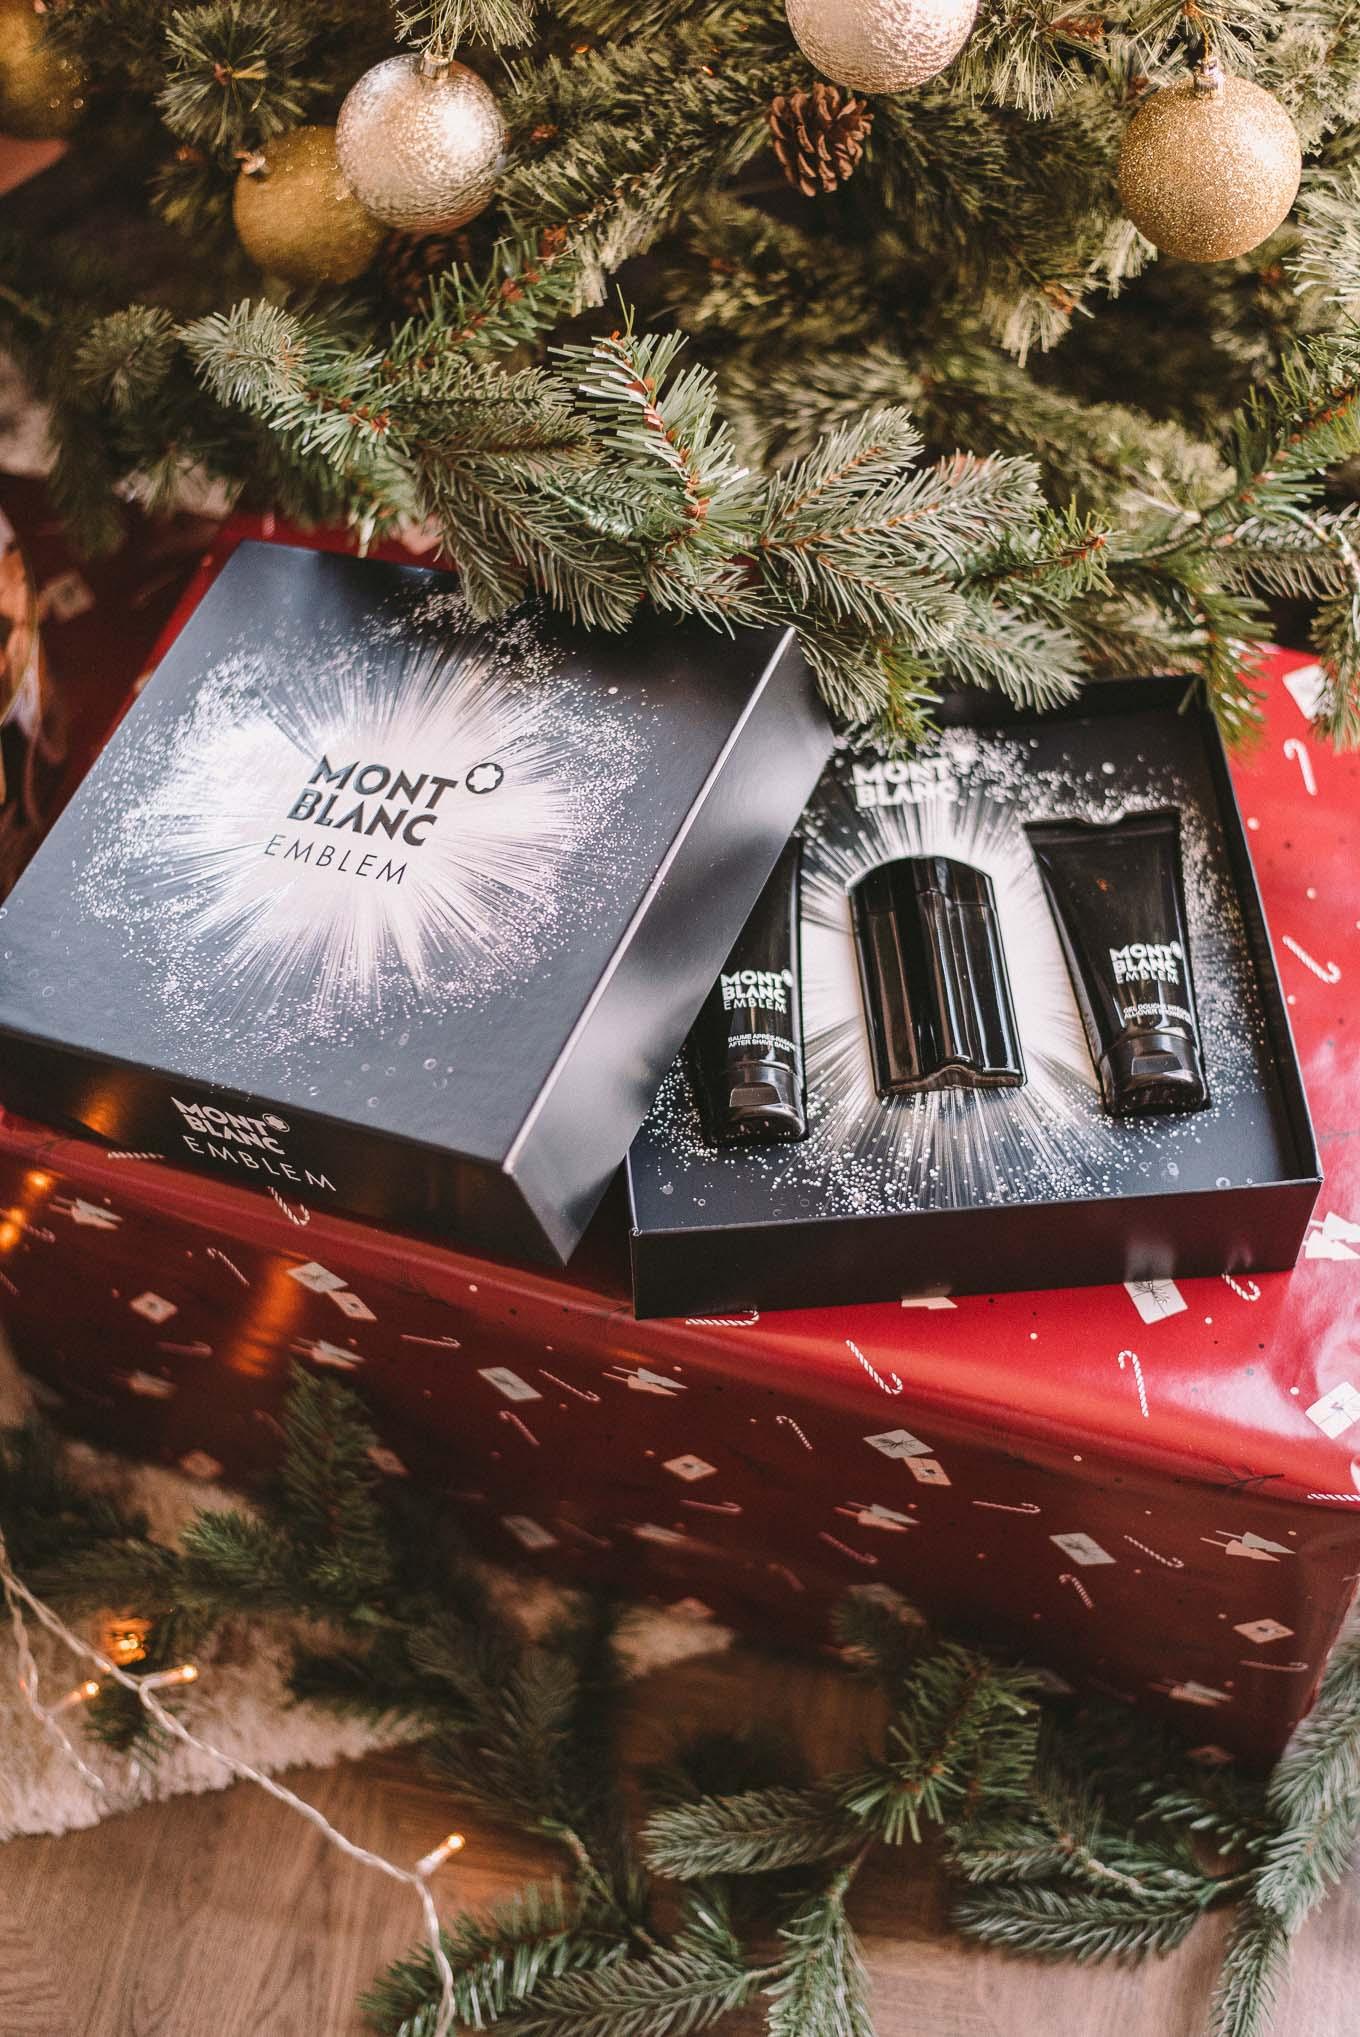 My Mont Blanc Emblem Christmas gift